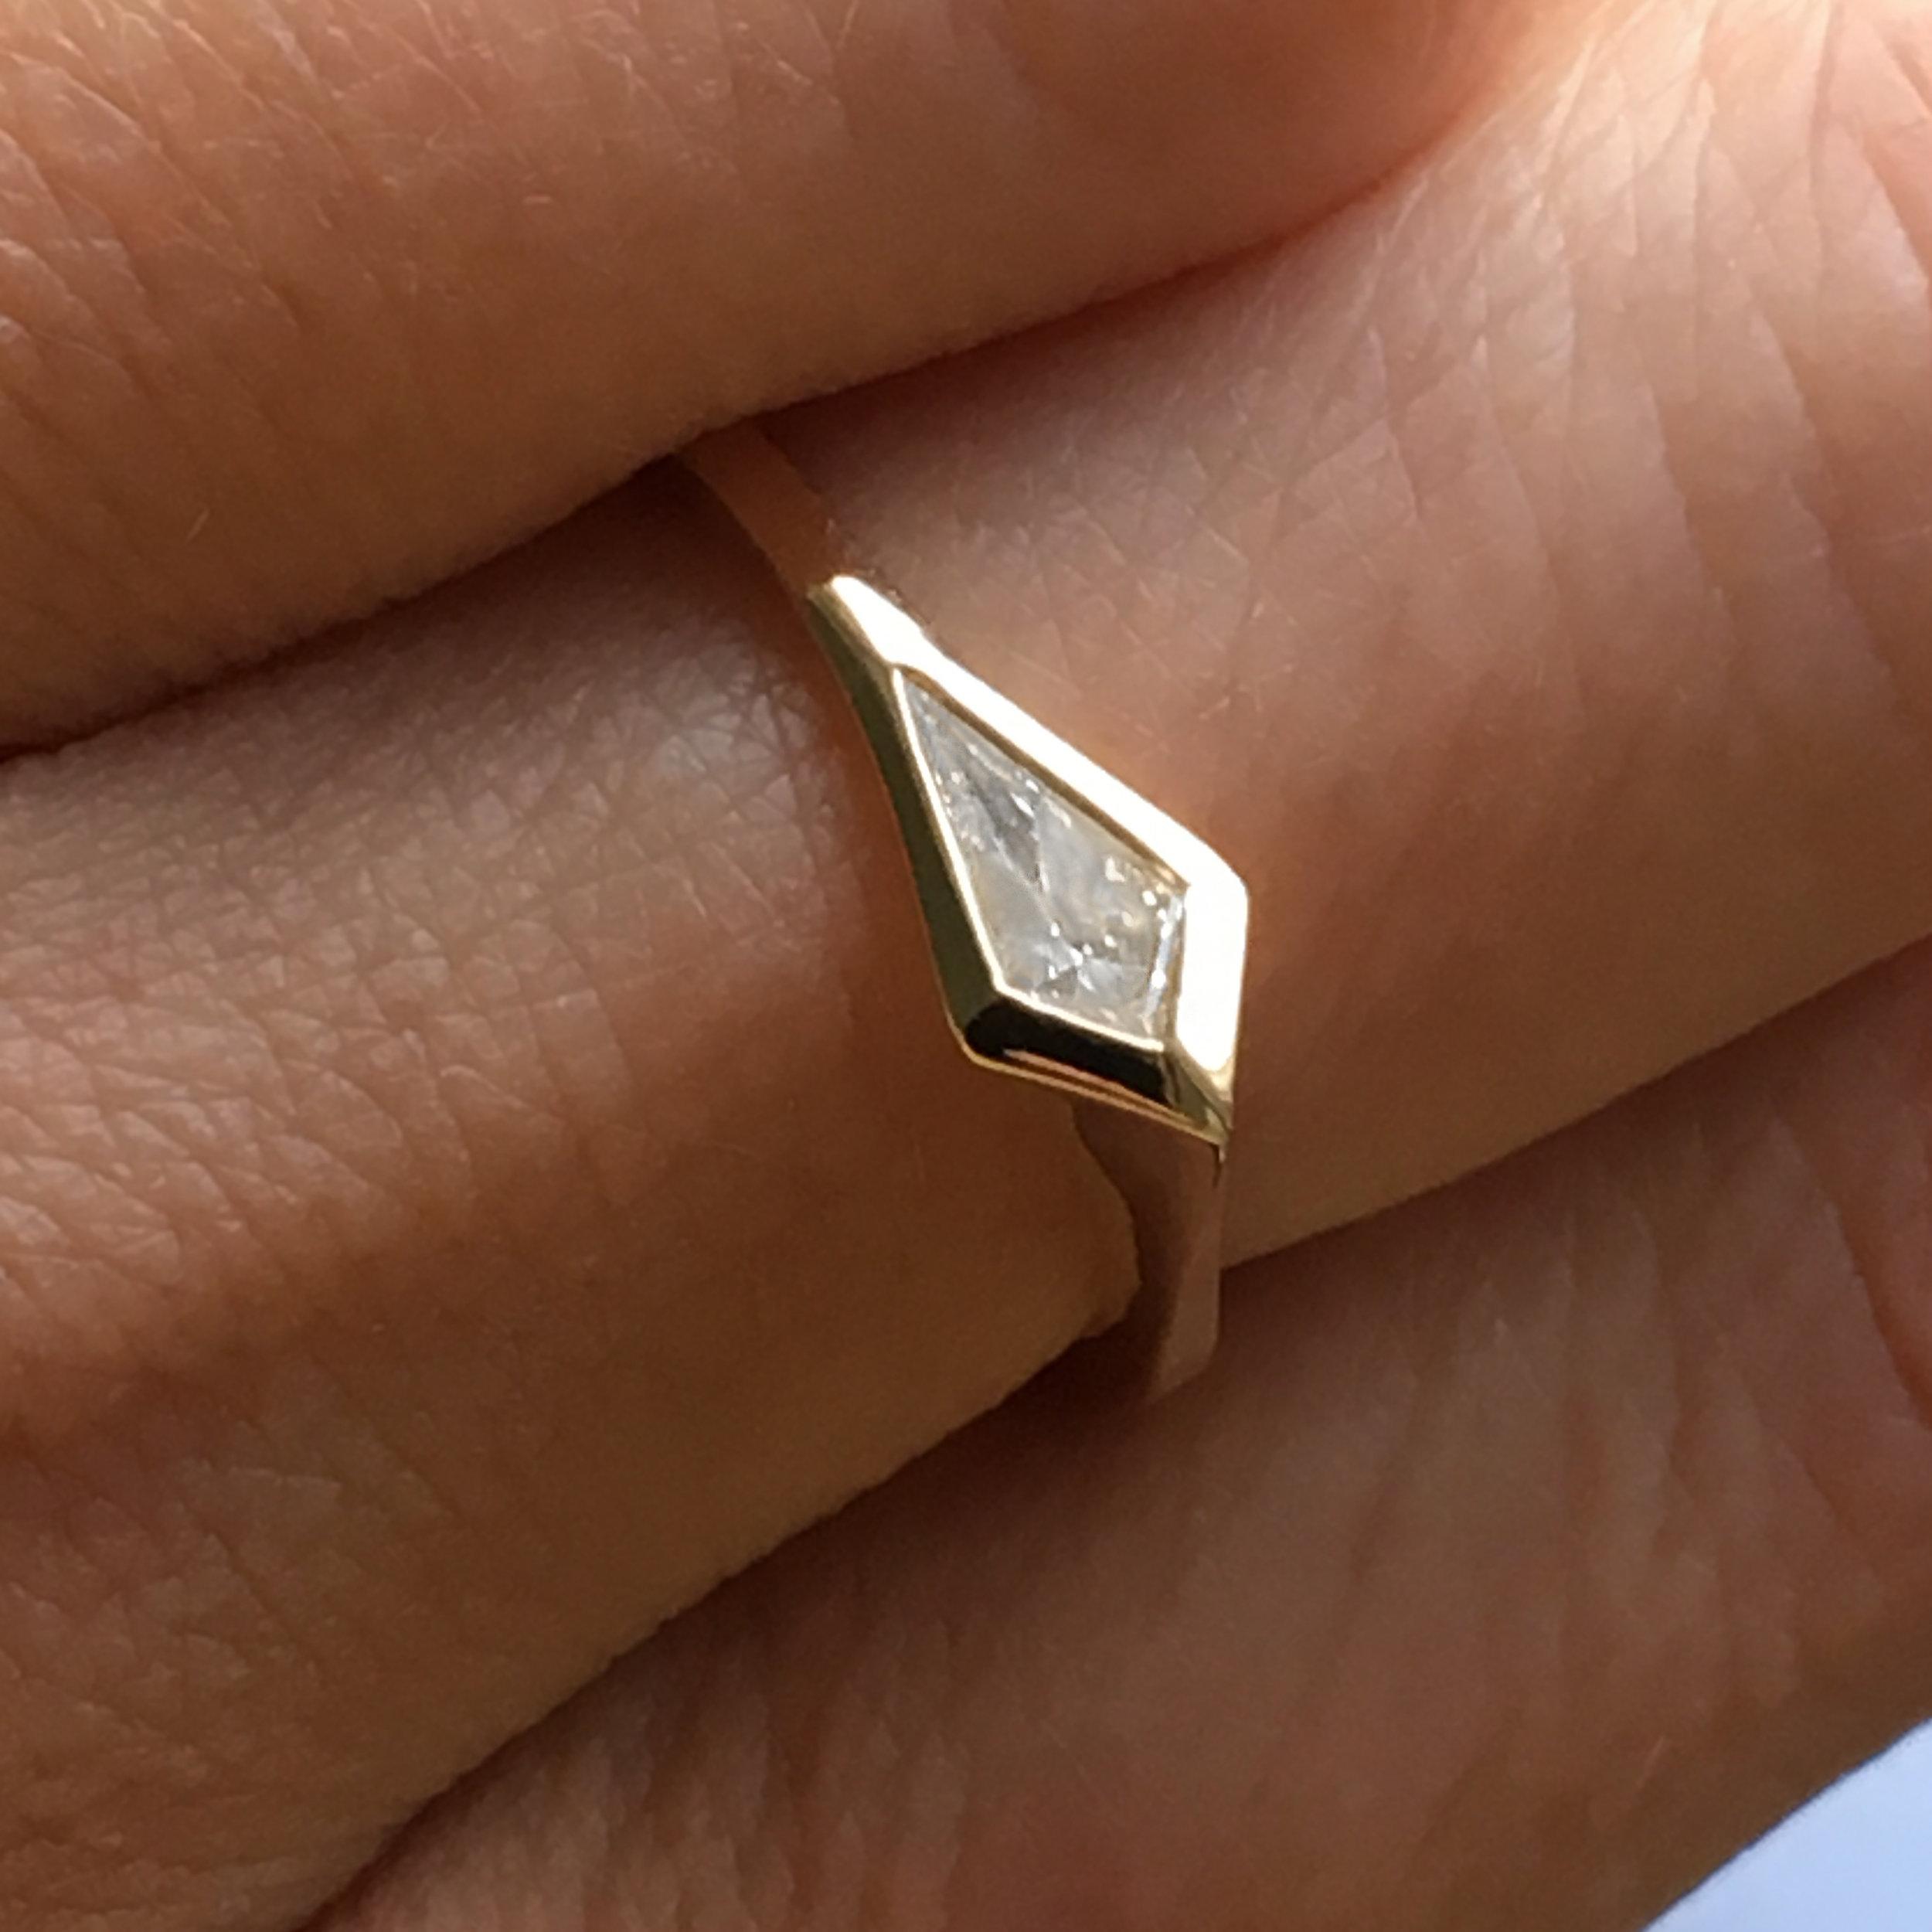 Tilda Biehn Brooklyn NYC Custom kite diamond engagement ring